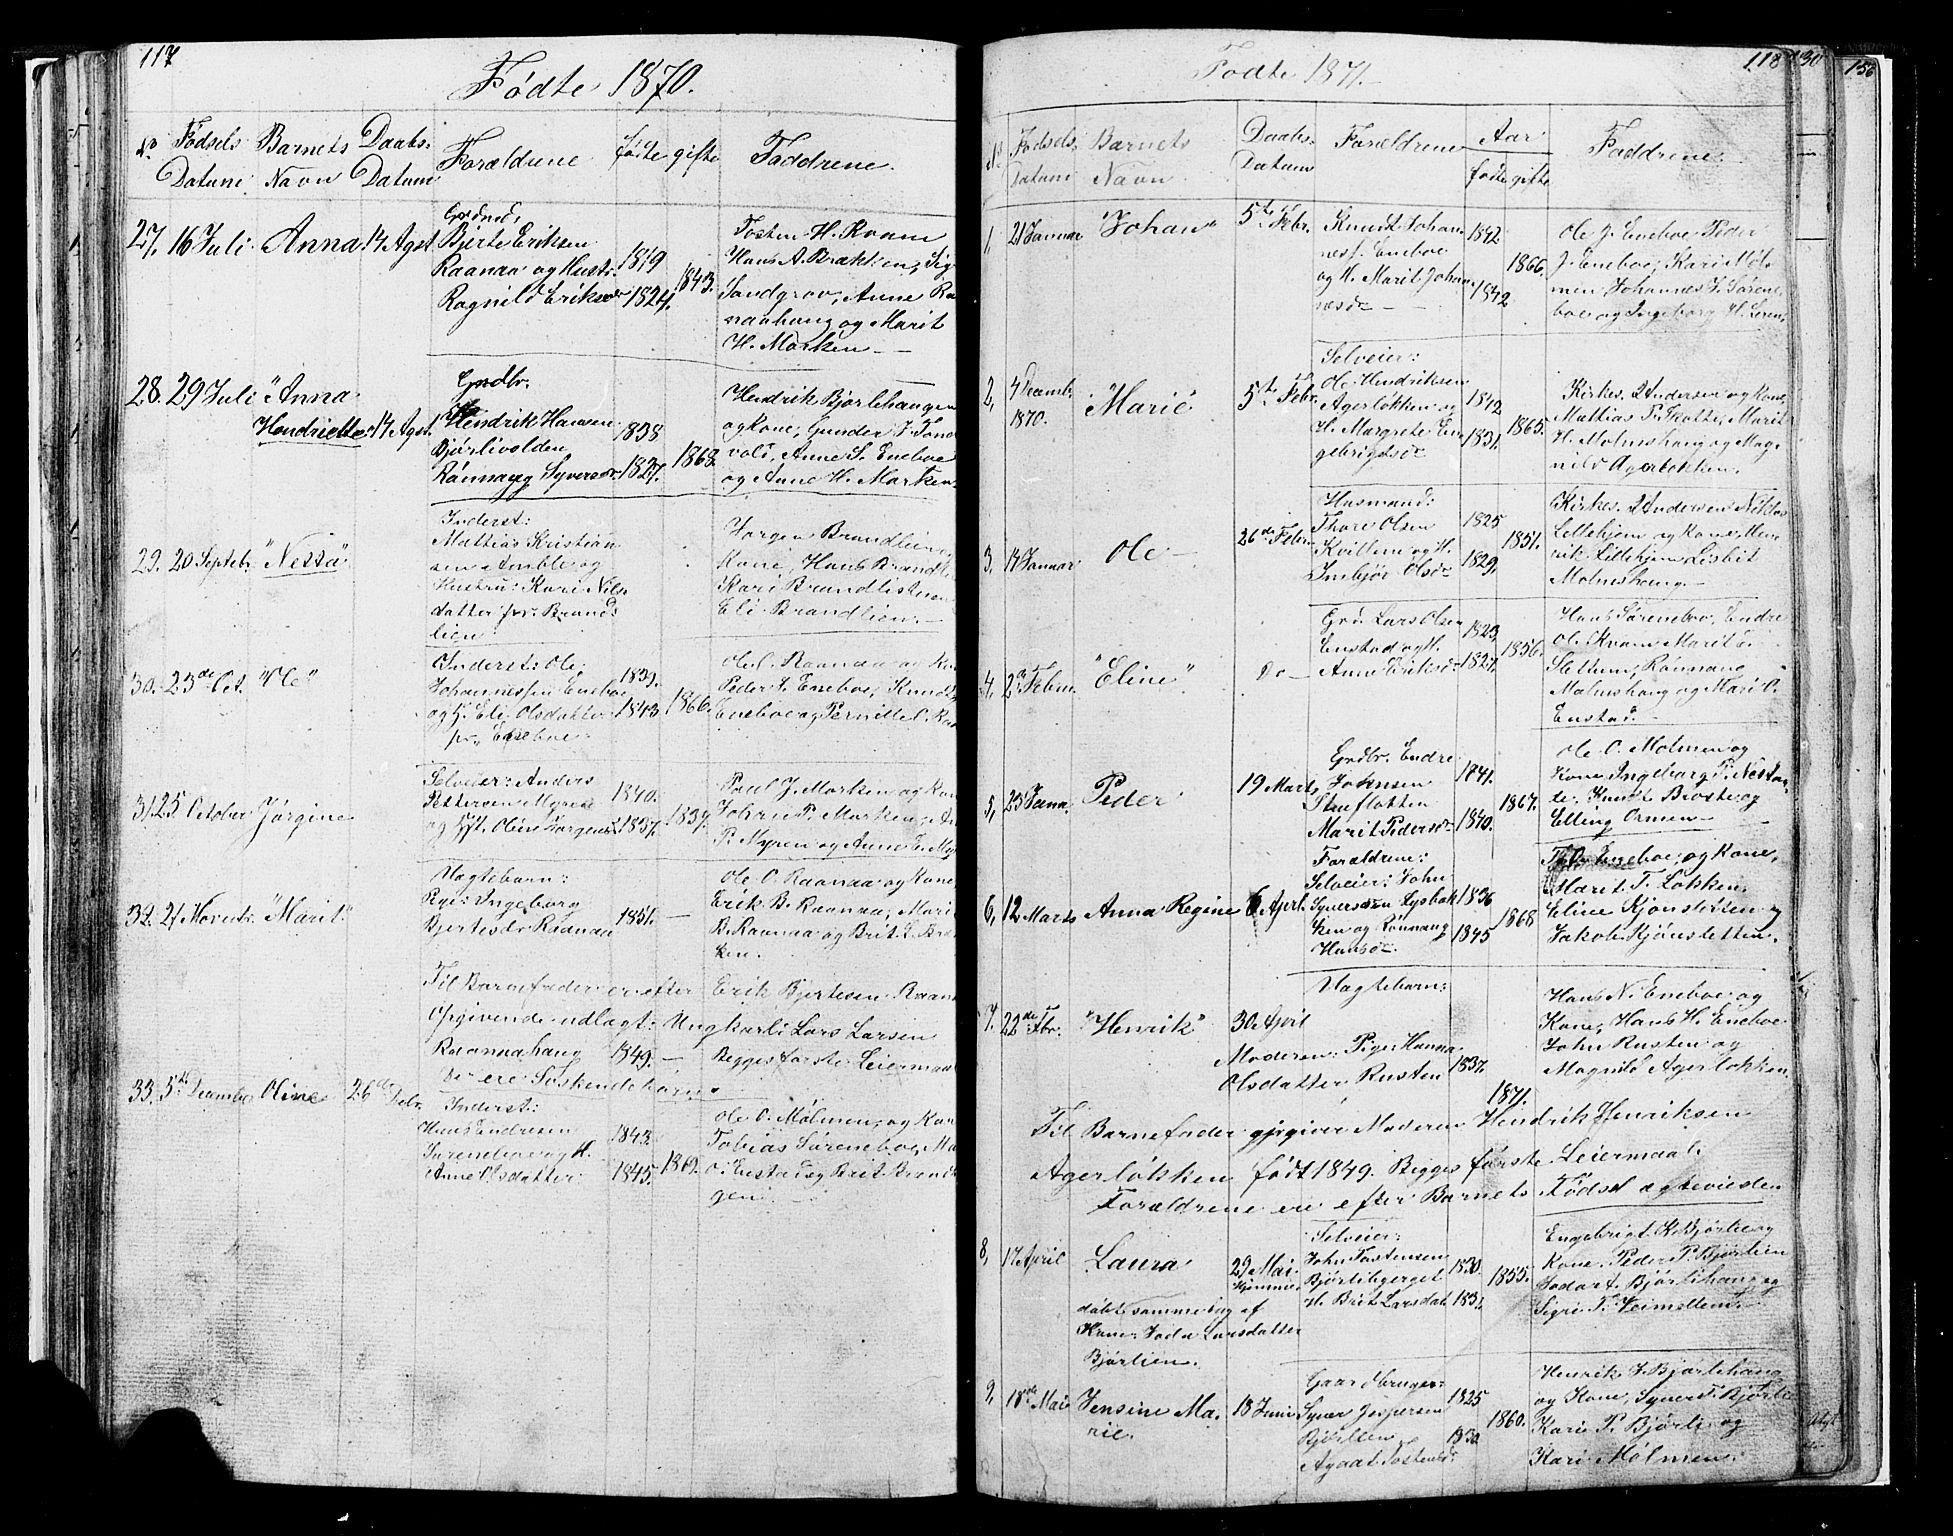 SAH, Lesja prestekontor, Klokkerbok nr. 4, 1842-1871, s. 117-118